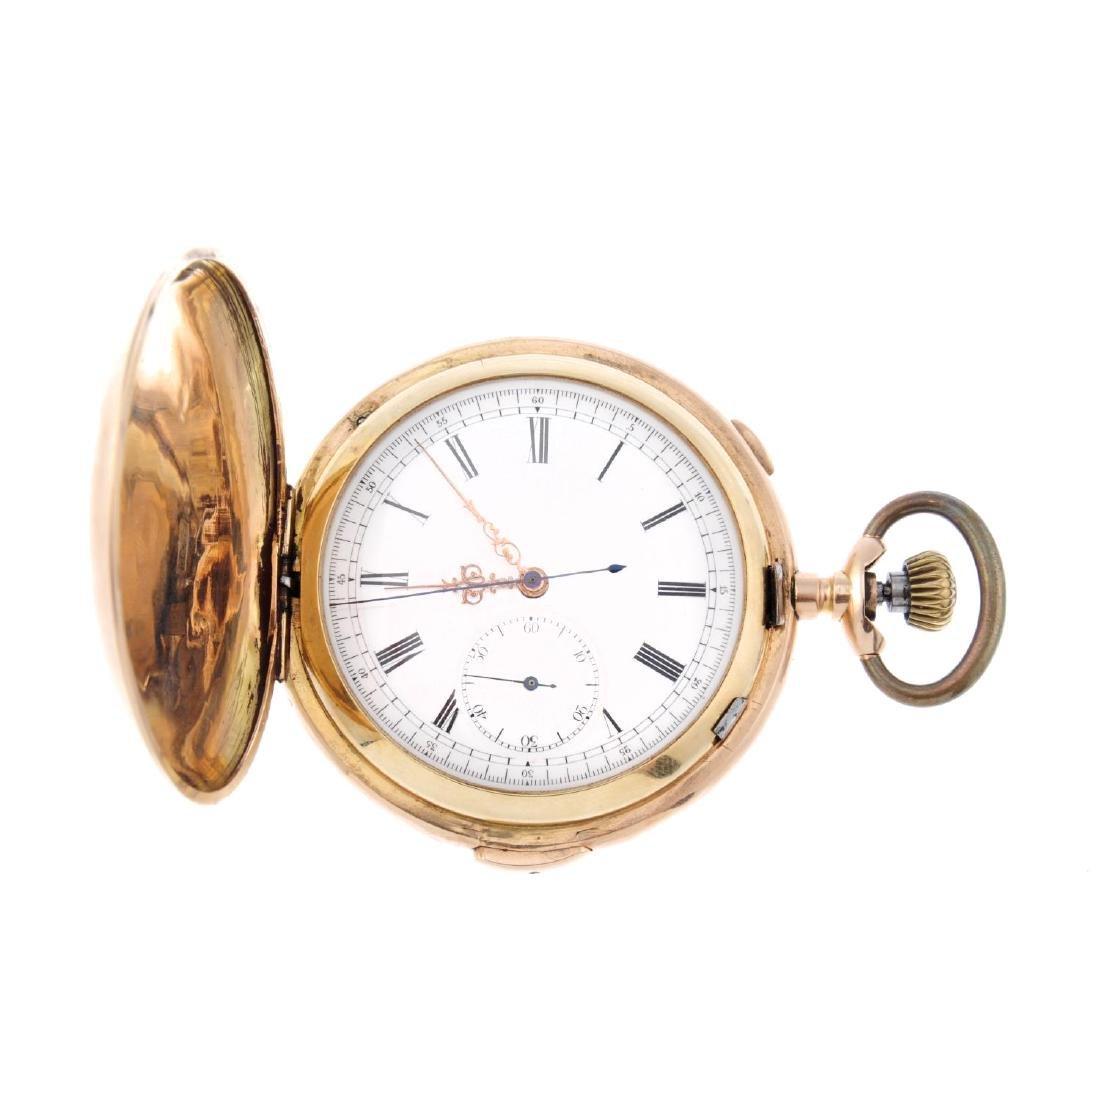 A full hunter quarter repeater chronograph pocket